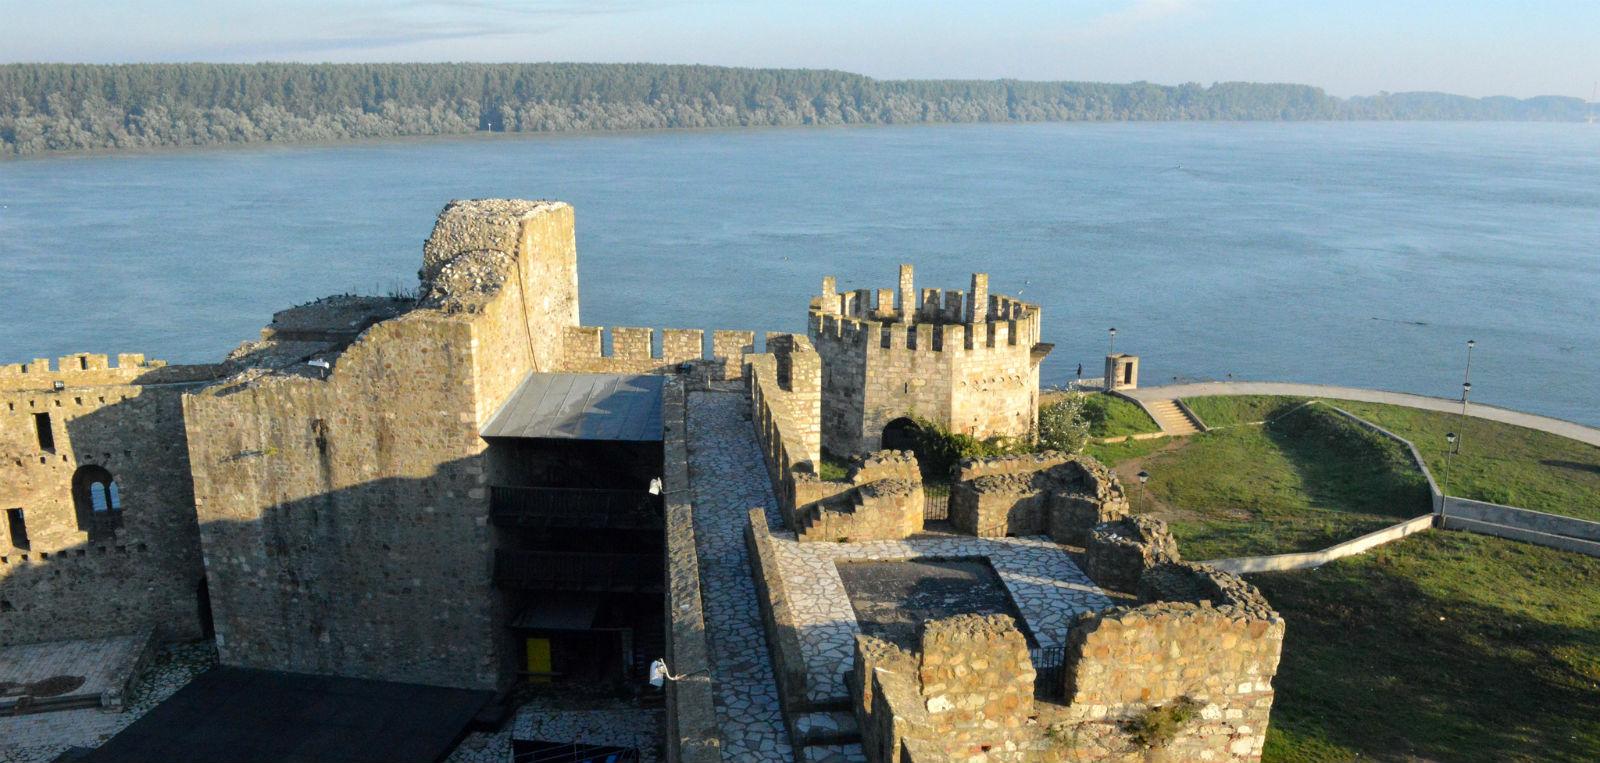 Smederevo fortress and the damned despotess - Serbia.com